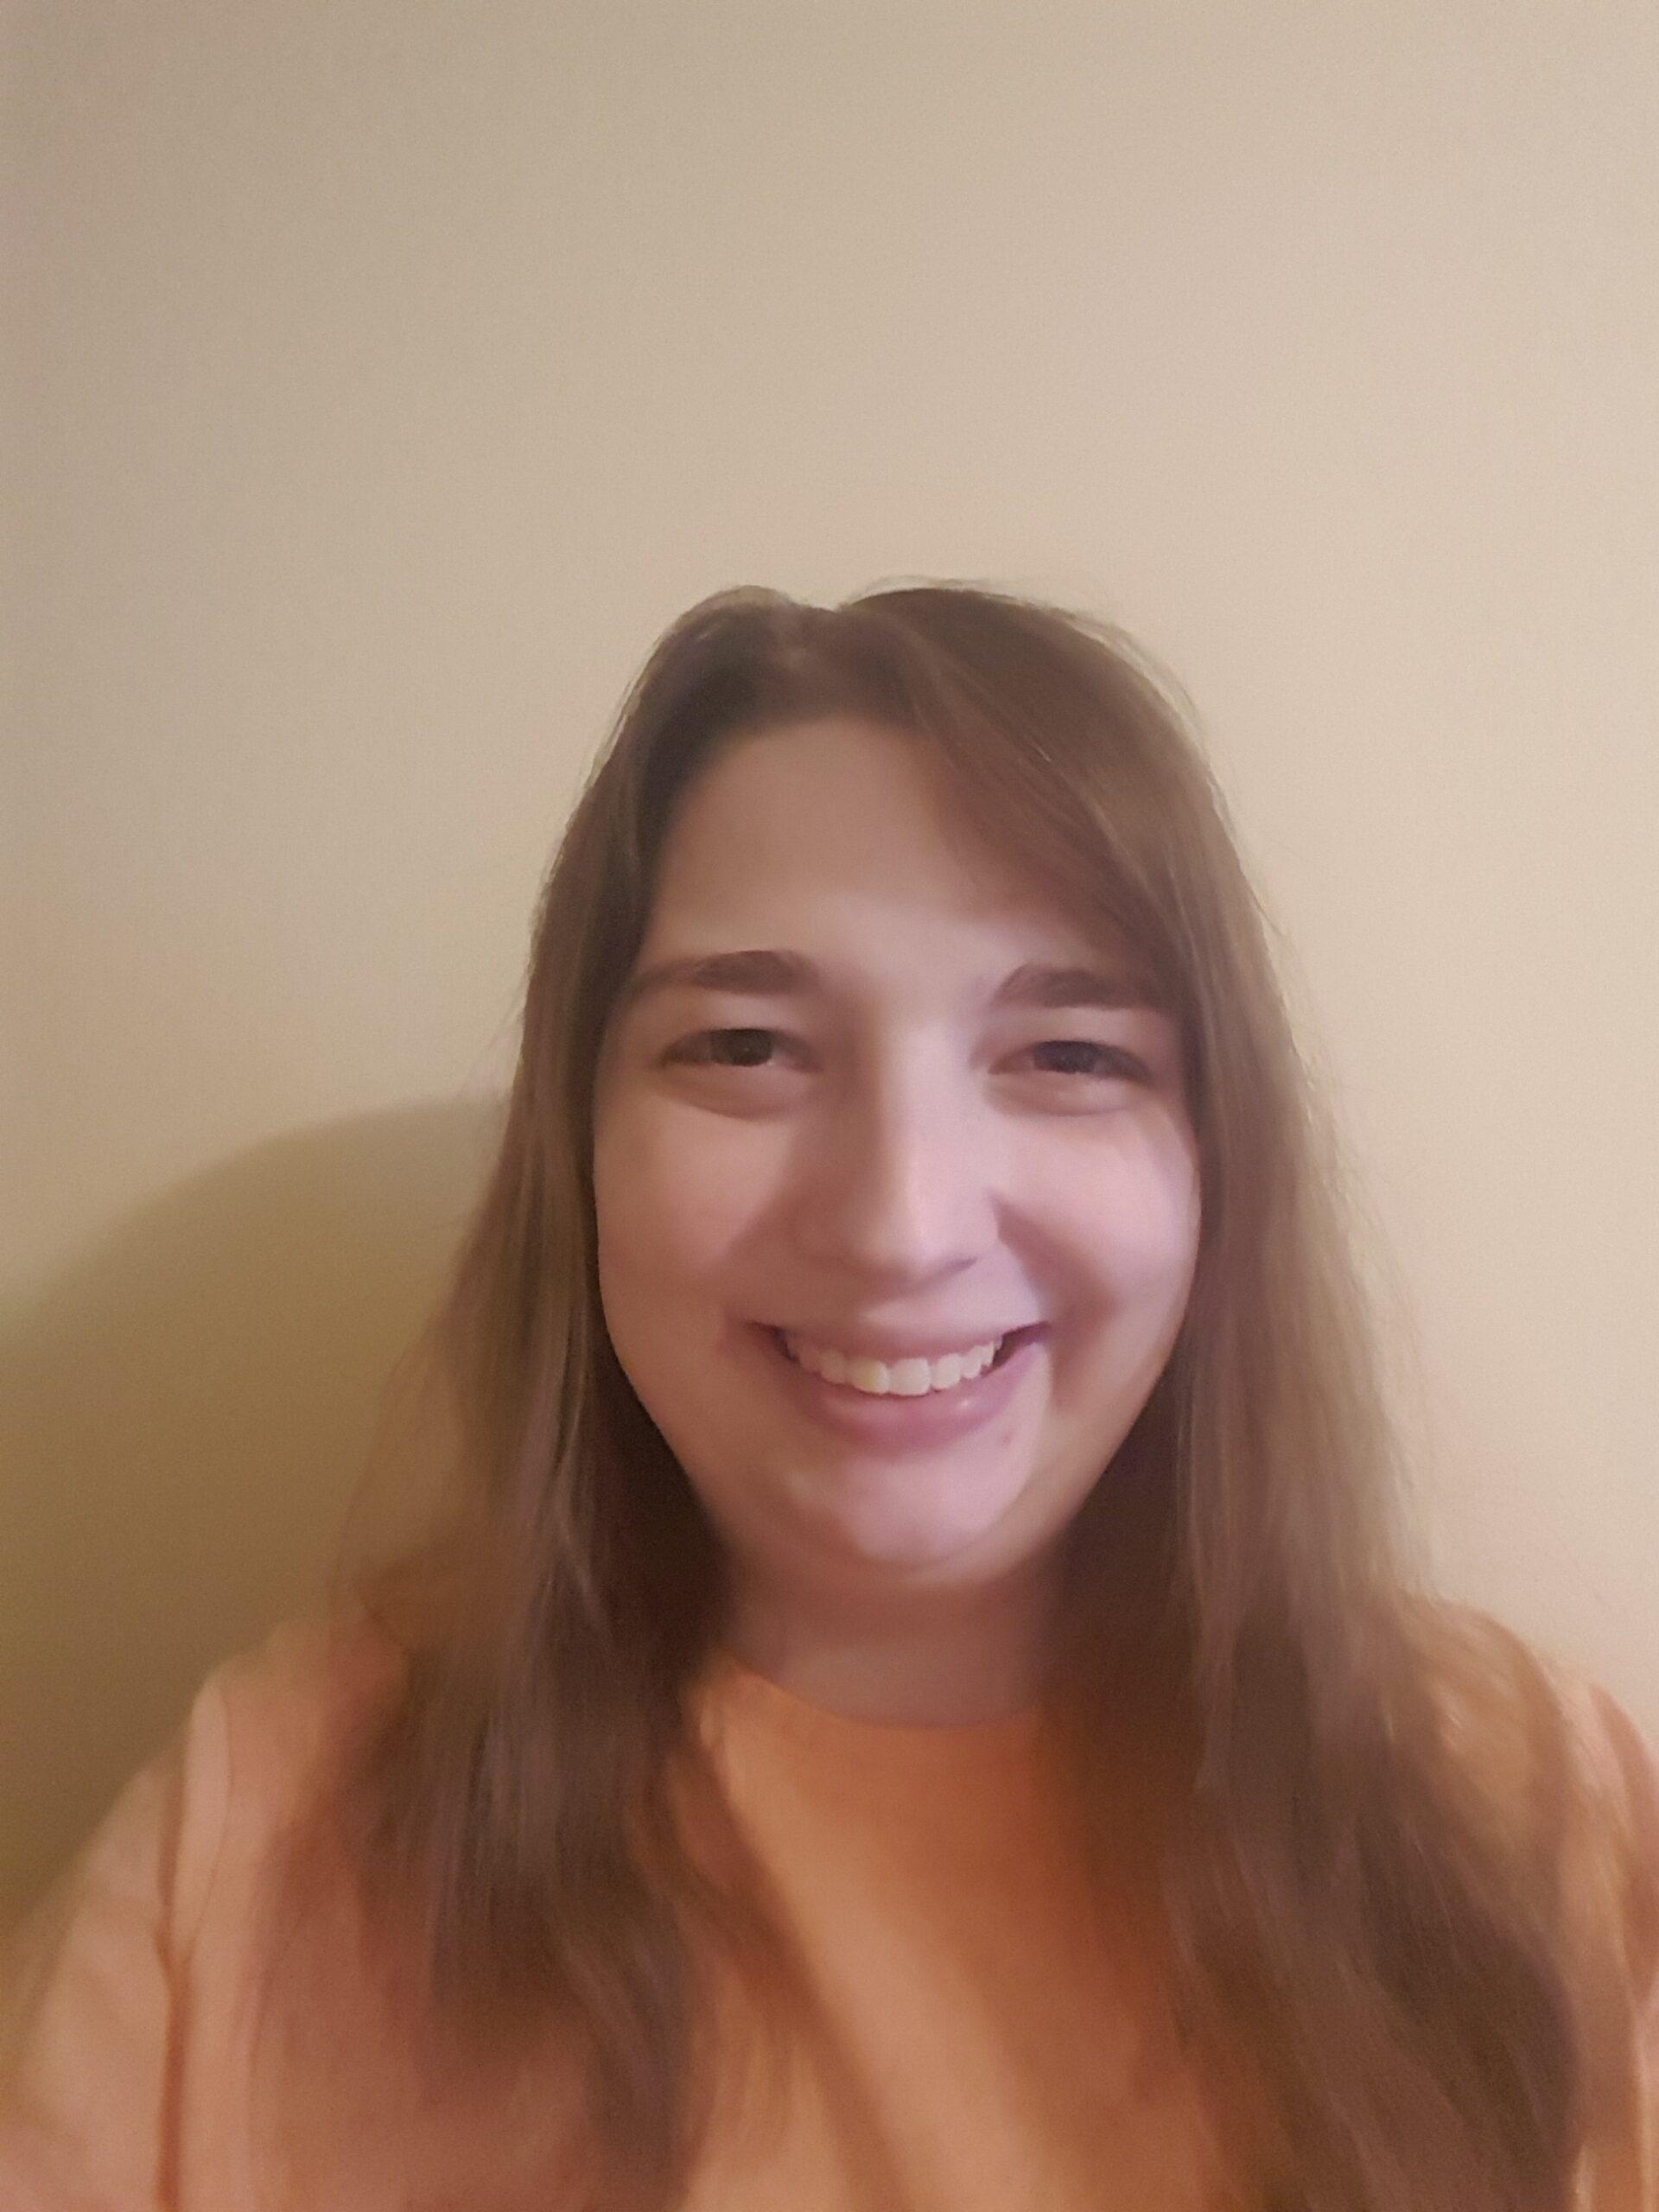 Ann Arbor MI Psychologist, Counselor, Psychotherapist, Therapist Lauren Ochs, LLMSW